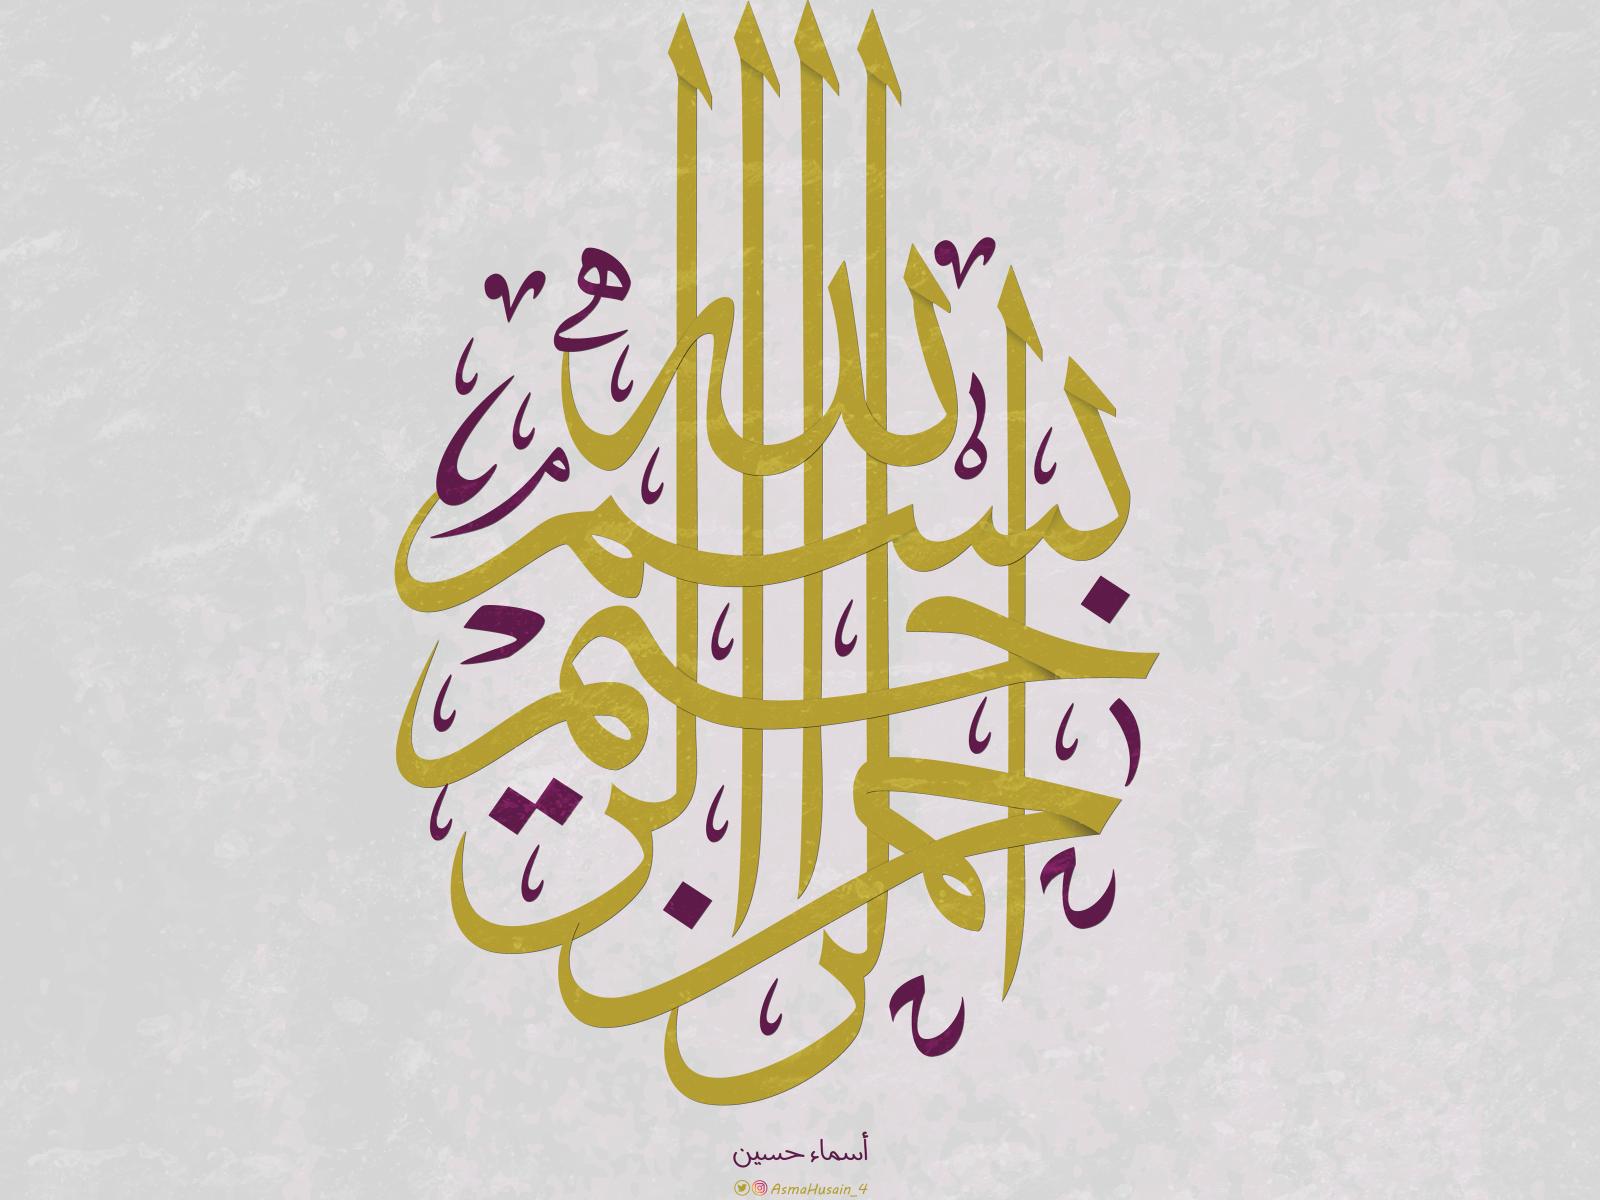 بسم الله الرحمن الرحيم In The Name Of Of Allah The Merciful White Wallpaper For Iphone Allah Flower Border